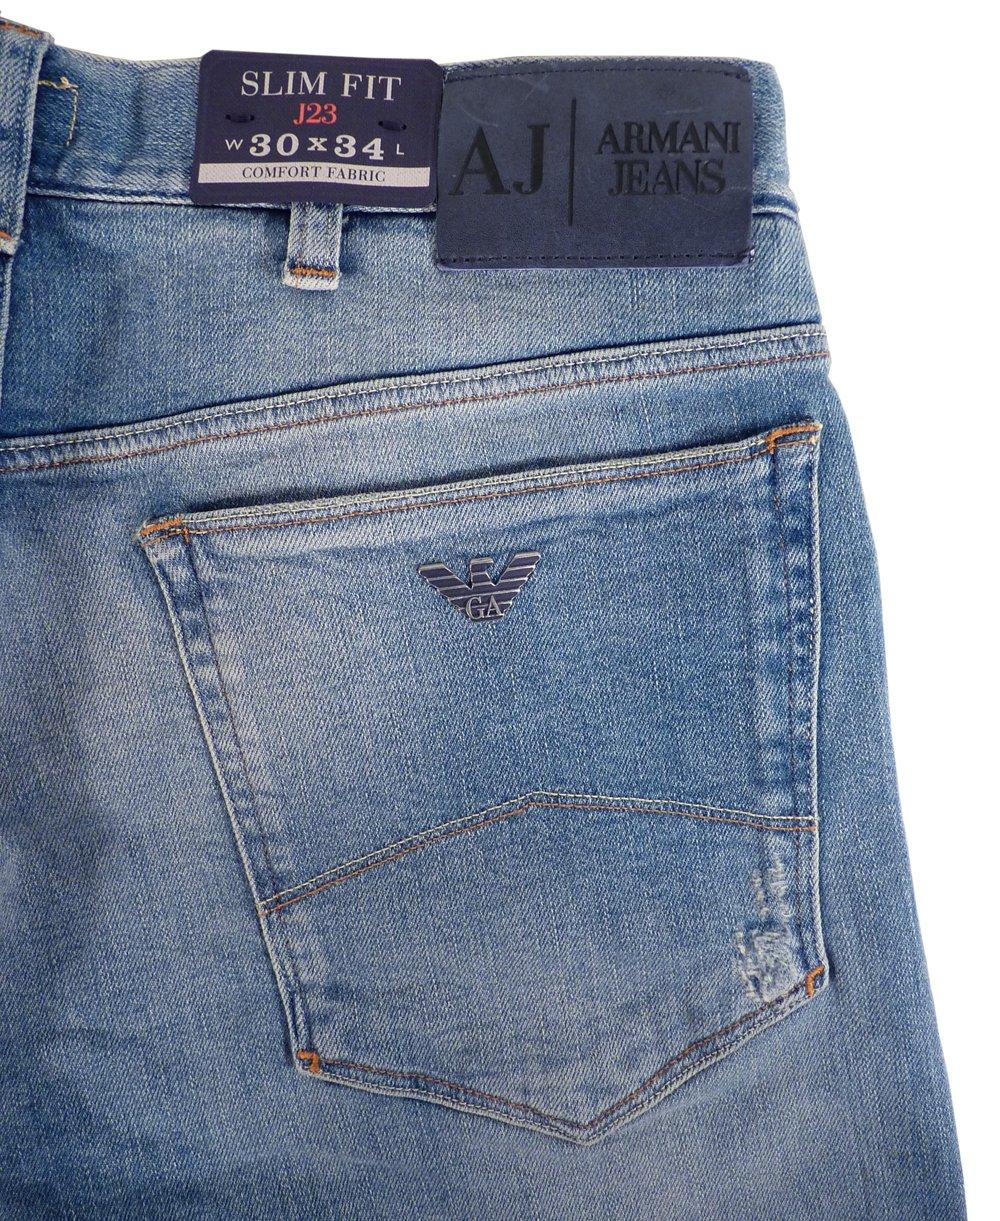 armani jeans light blue slim fit low waist j23 jeans. Black Bedroom Furniture Sets. Home Design Ideas